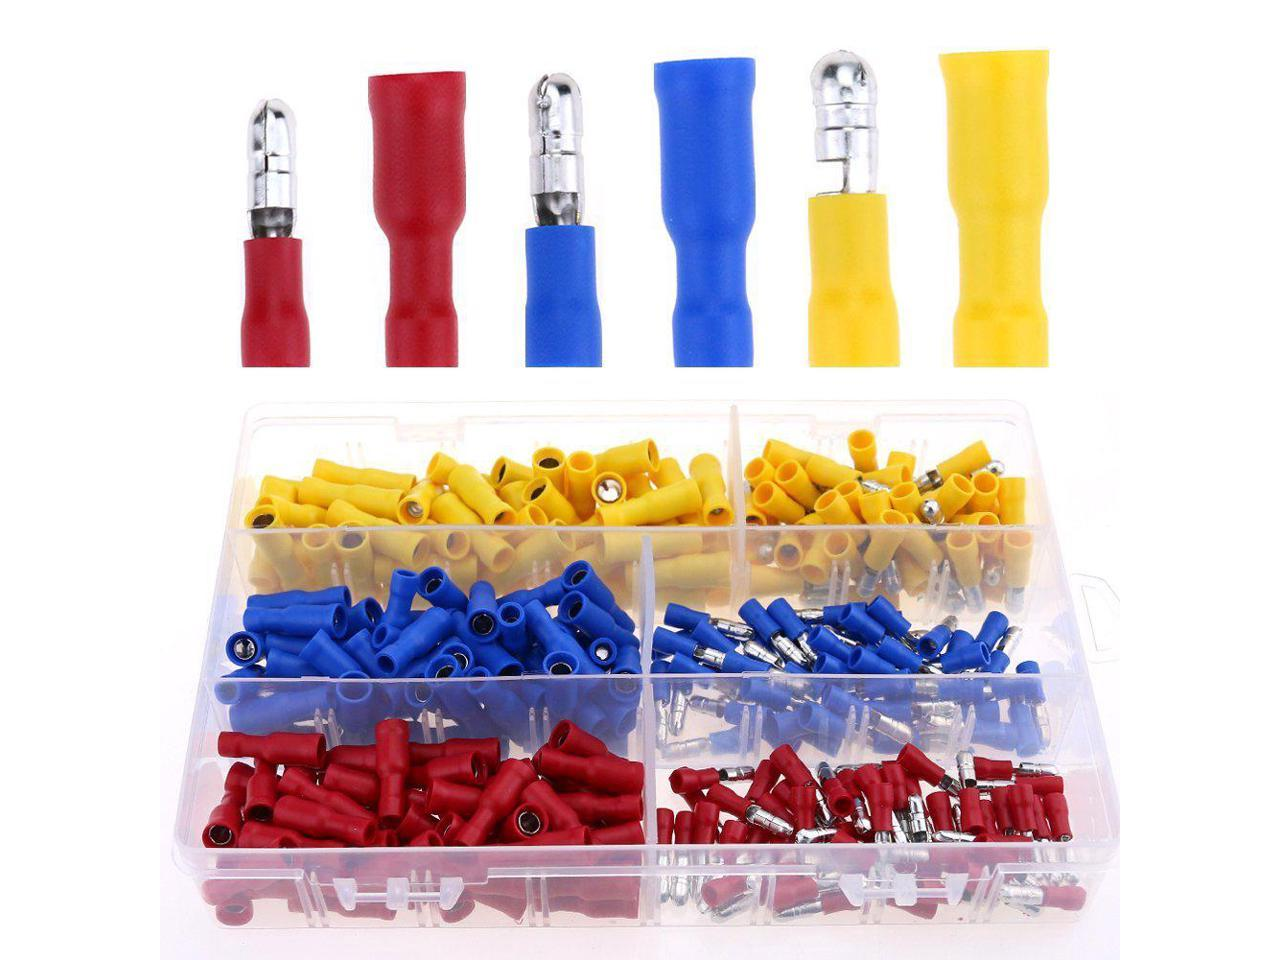 22-16 Gauge Insulated Male//Female Bullet Quick Splice Wire Terminals Crimp Set